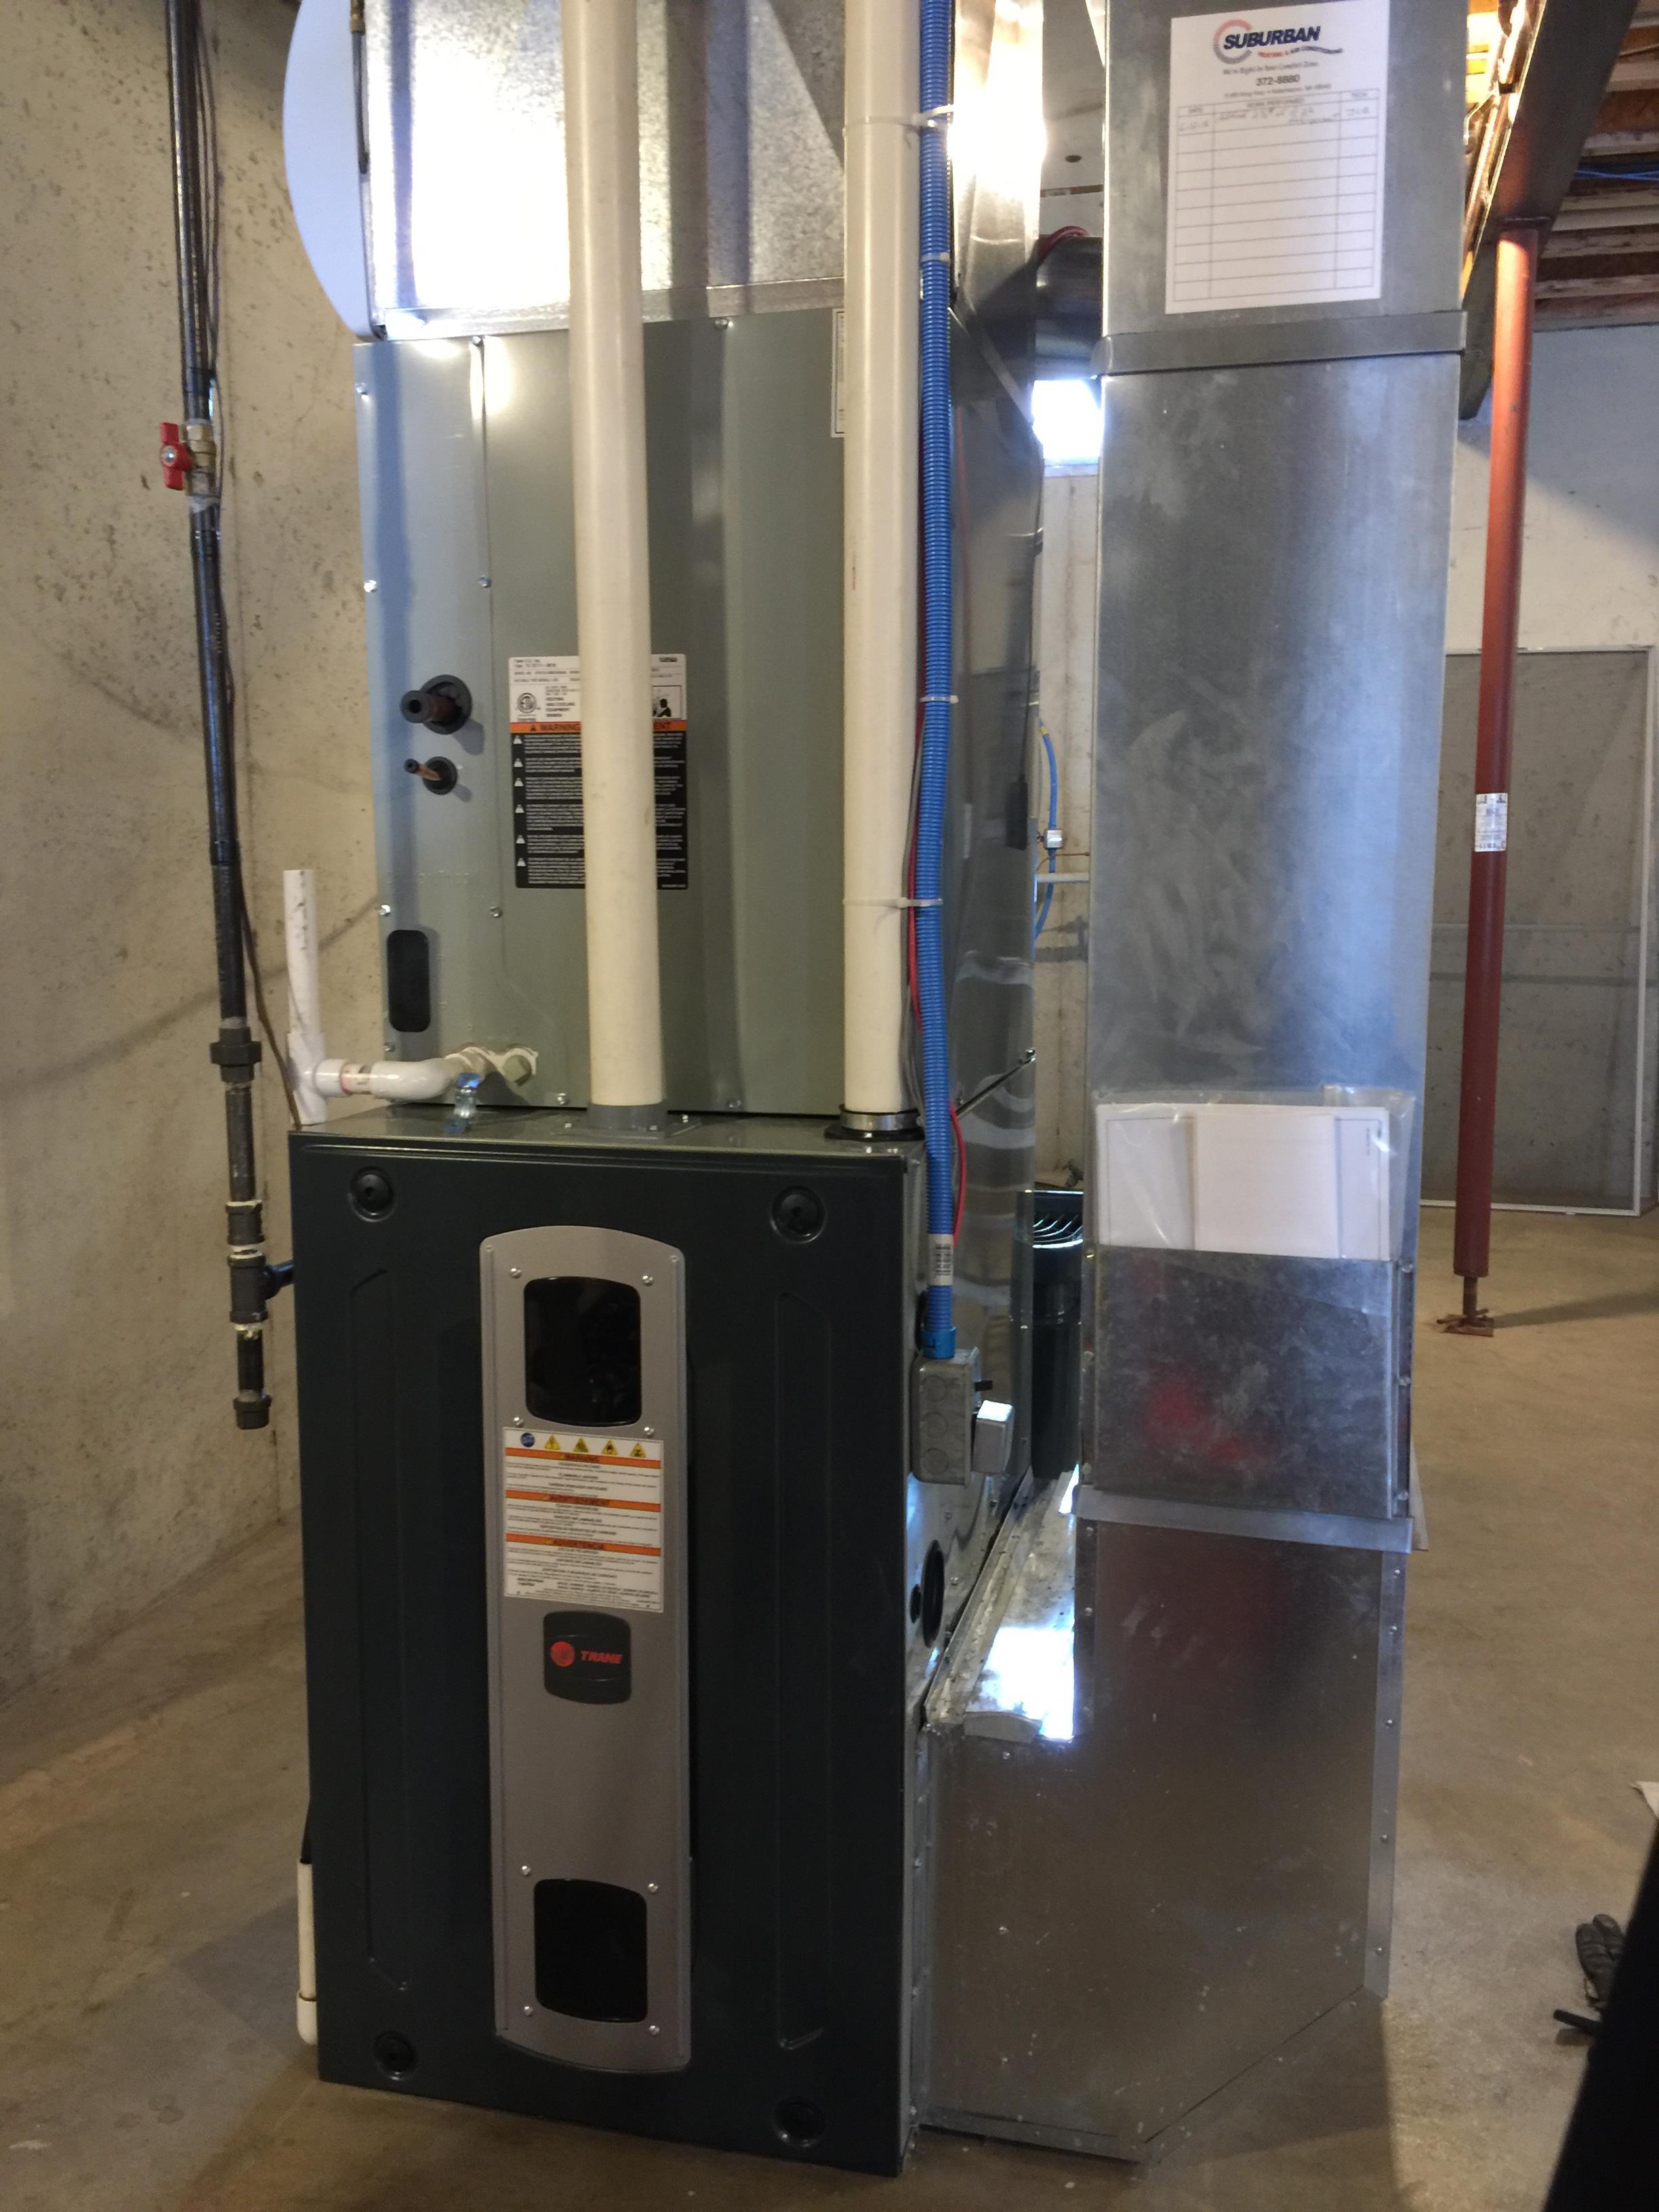 Air Conditioning Installation All American Plumbing Heating Cooling Kalamazoo Mi 269 906 9018